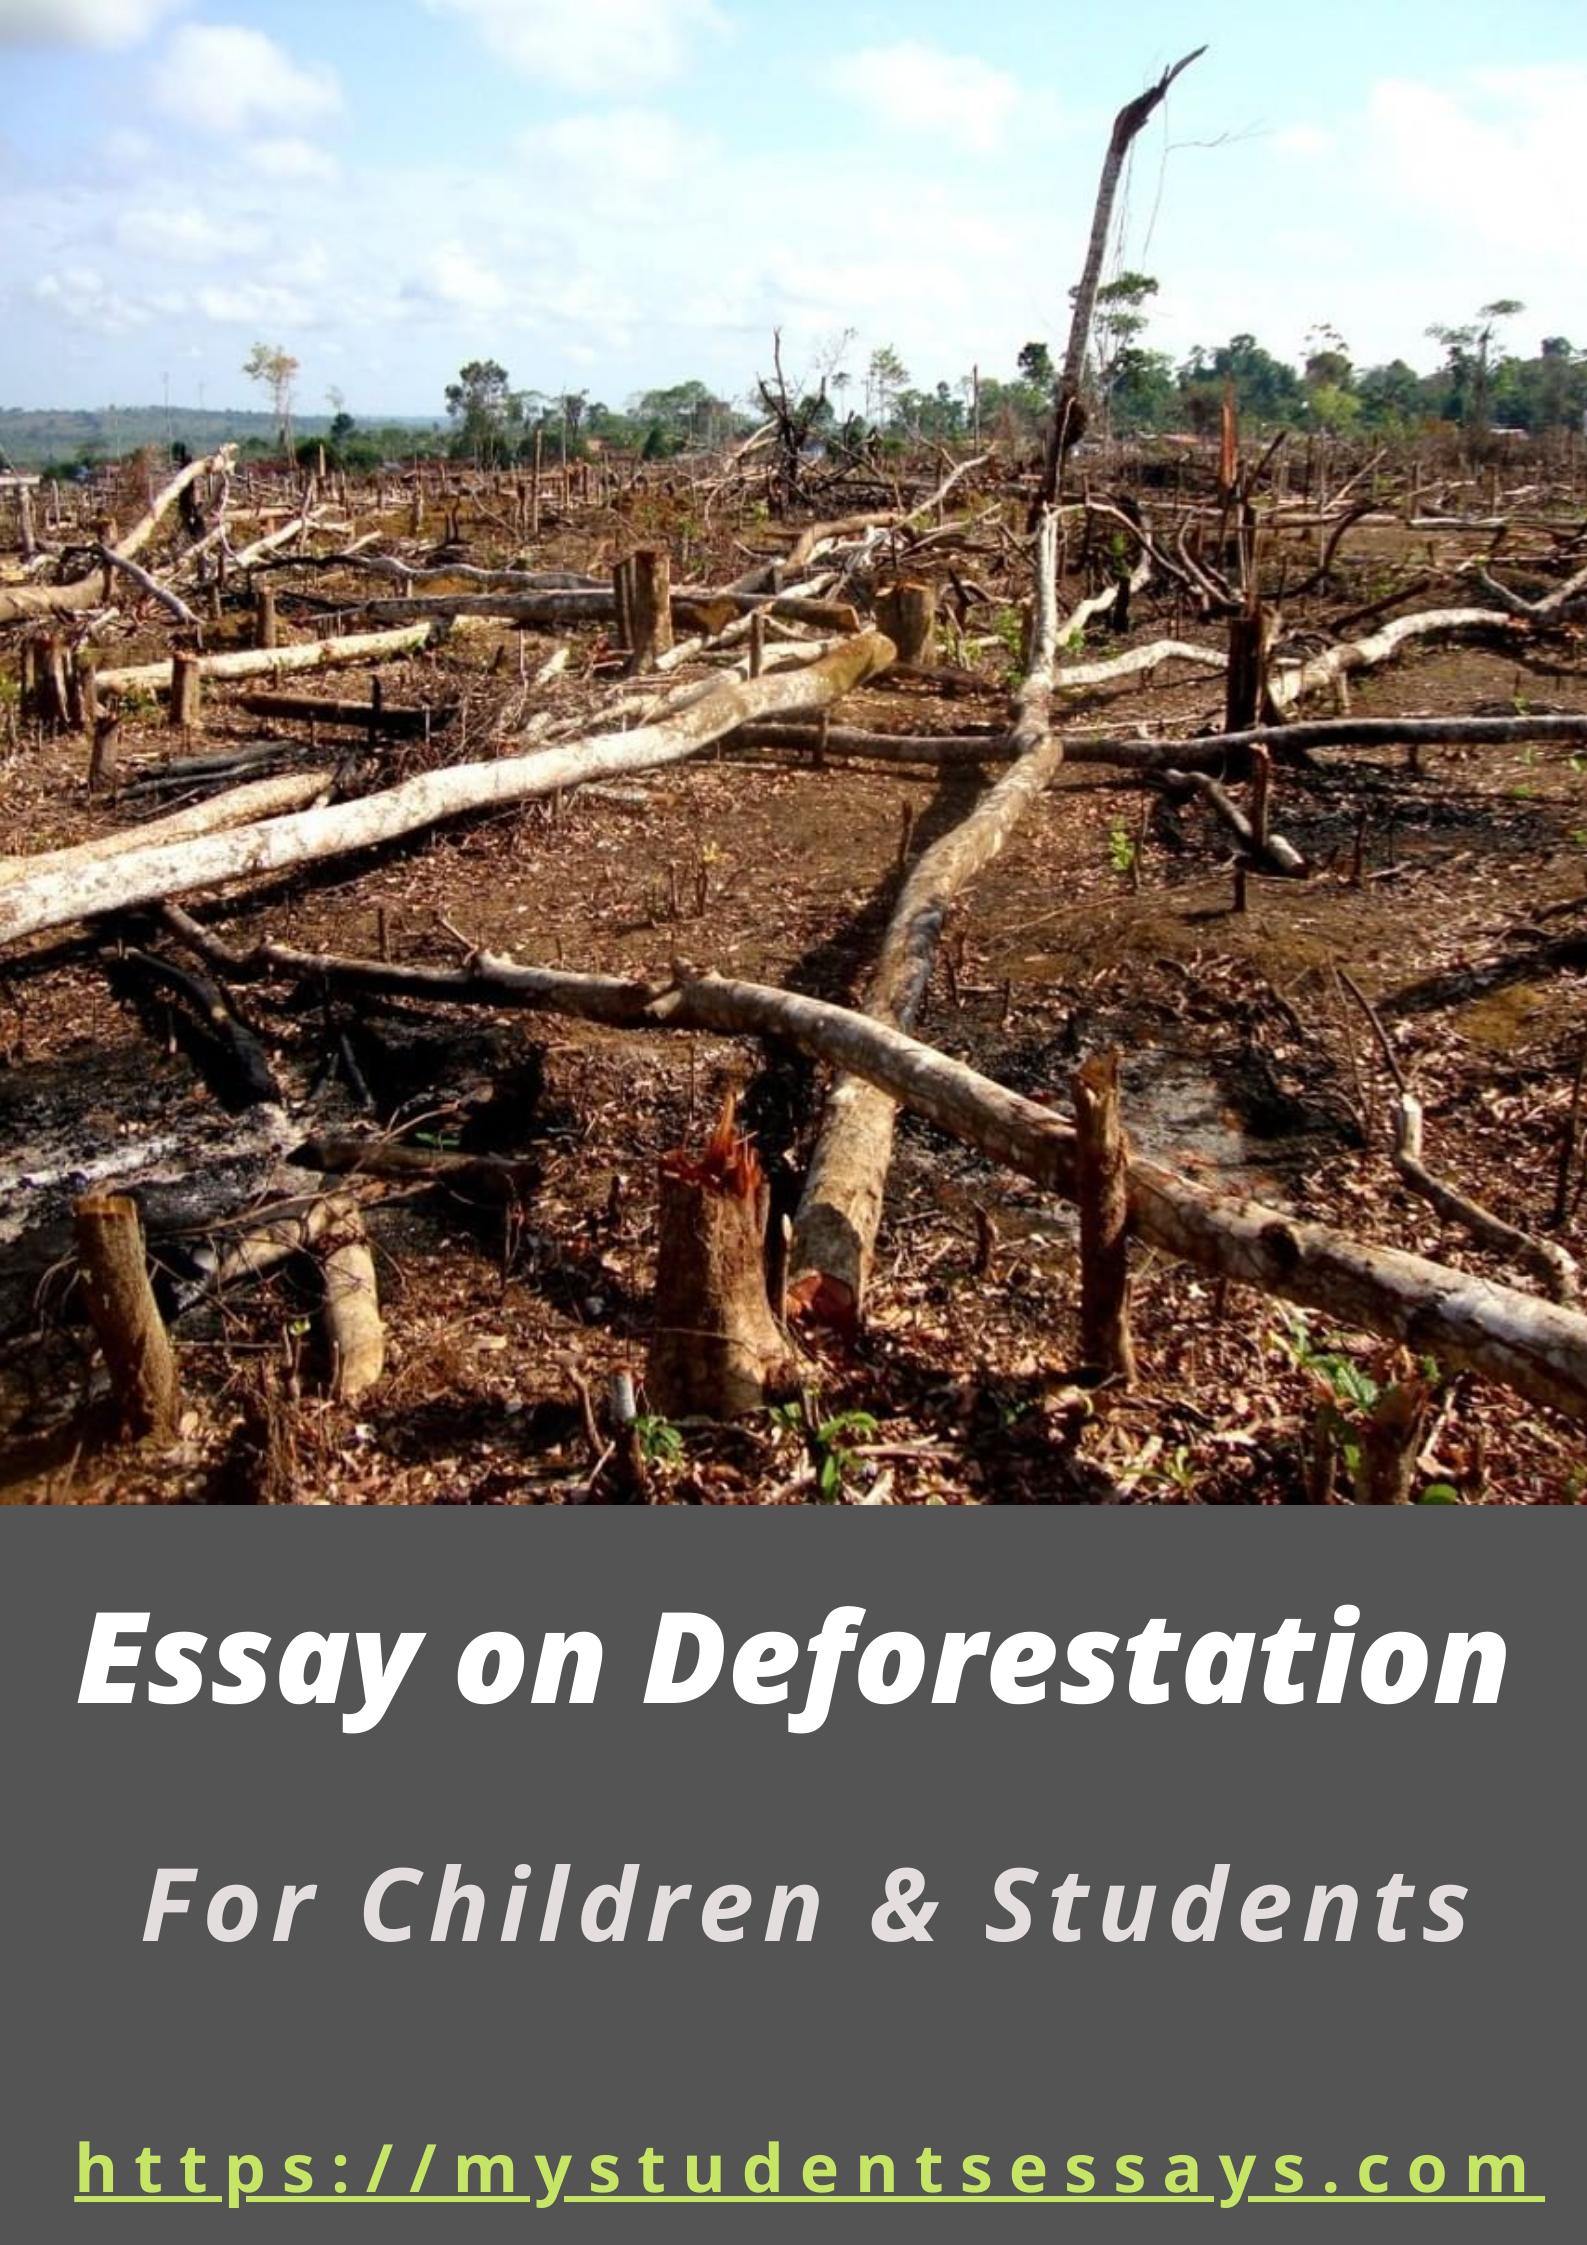 Essay & Paragraph on Deforestation